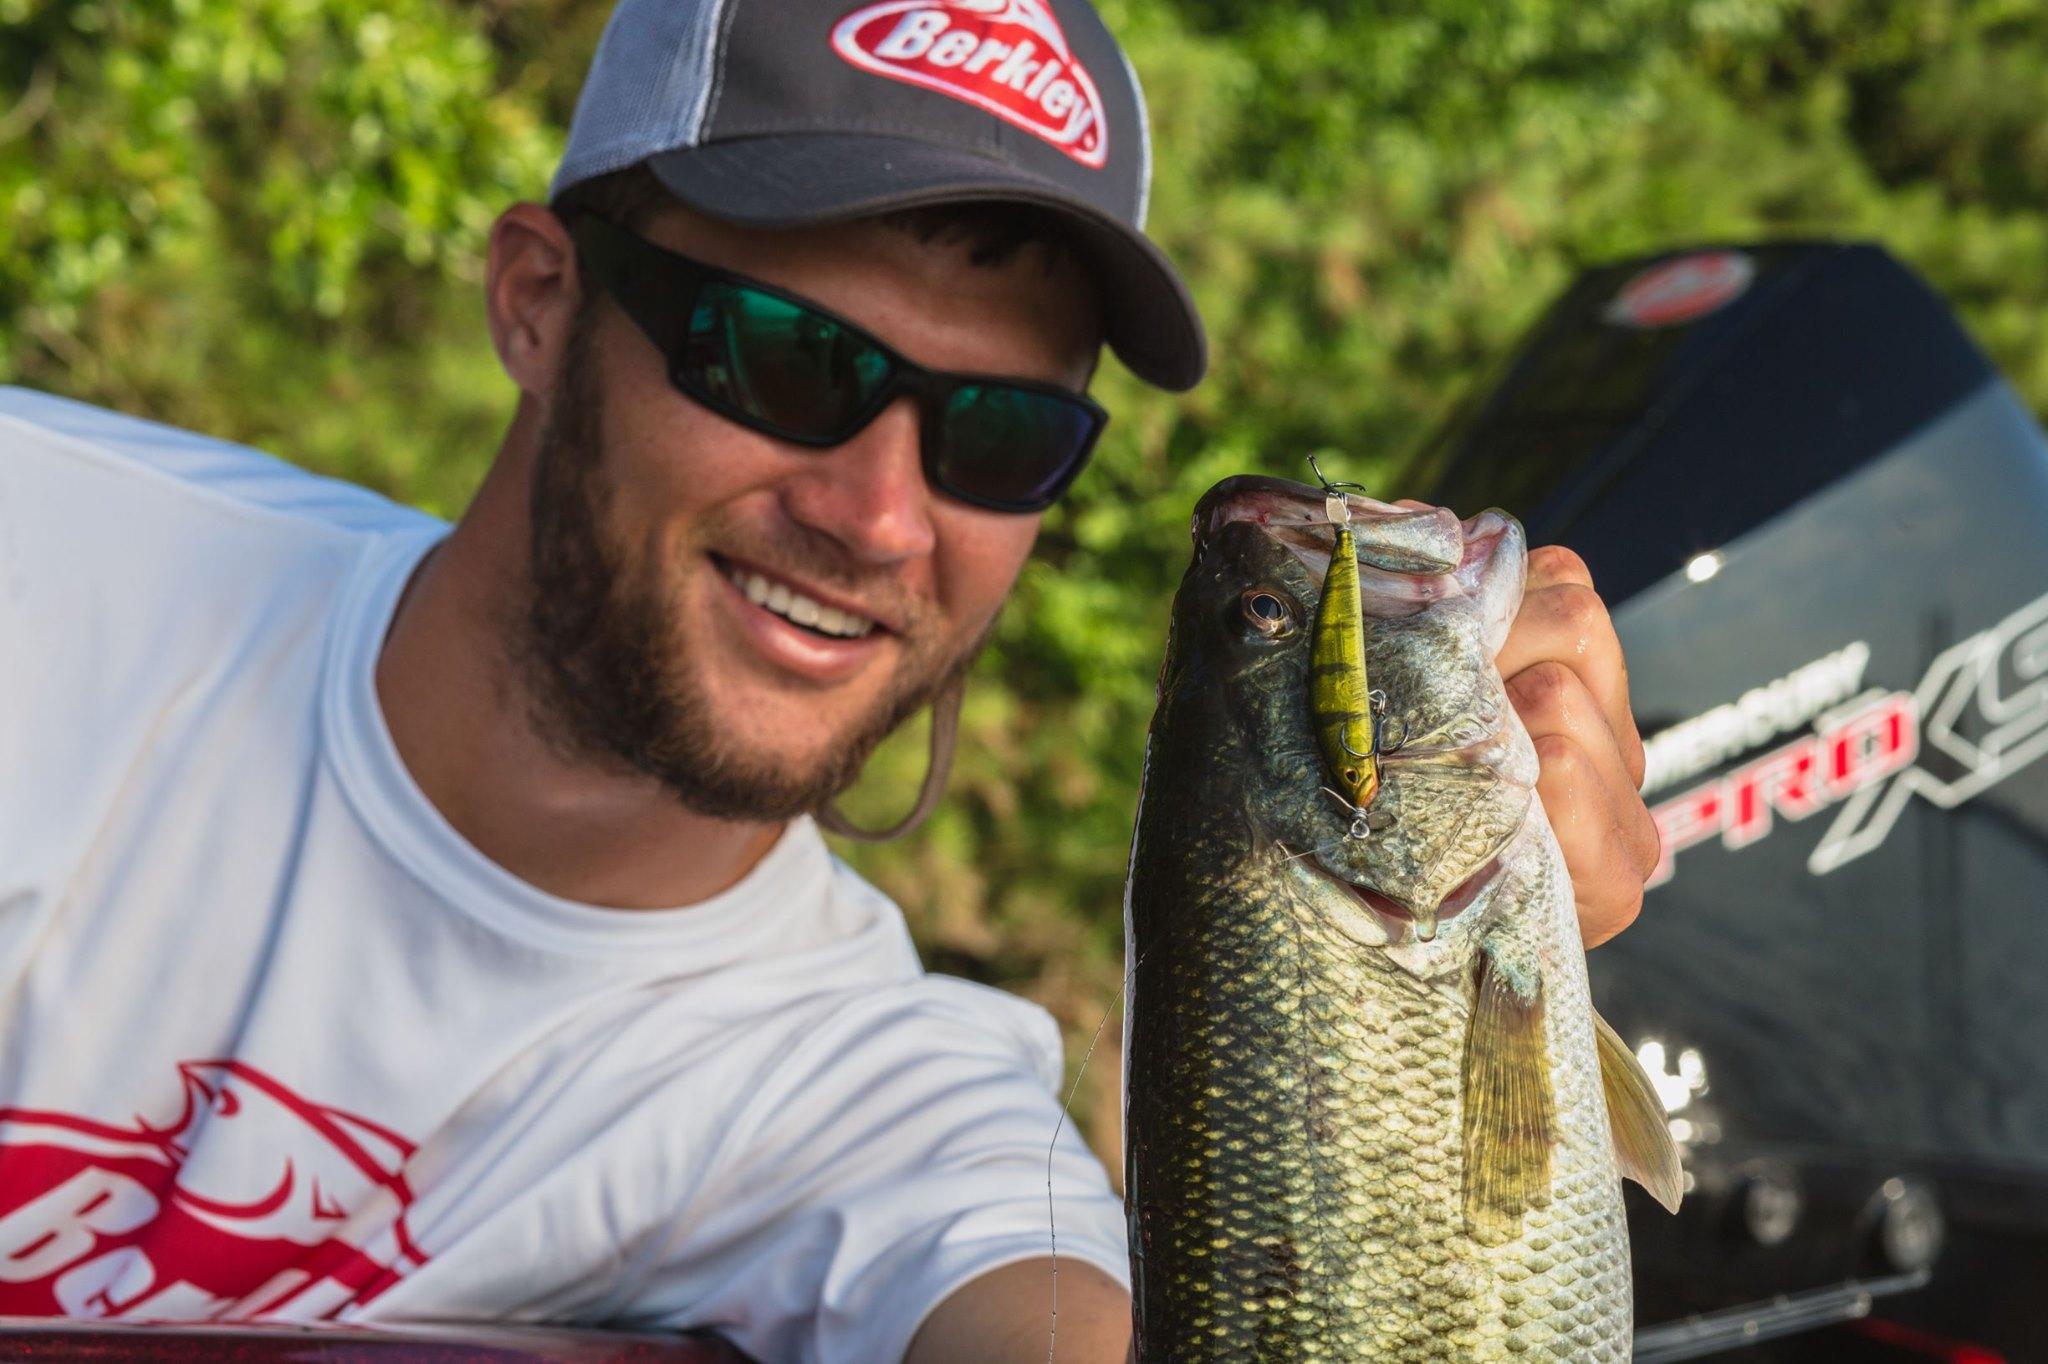 Pro Angler Josh Bertrand Lands Bass